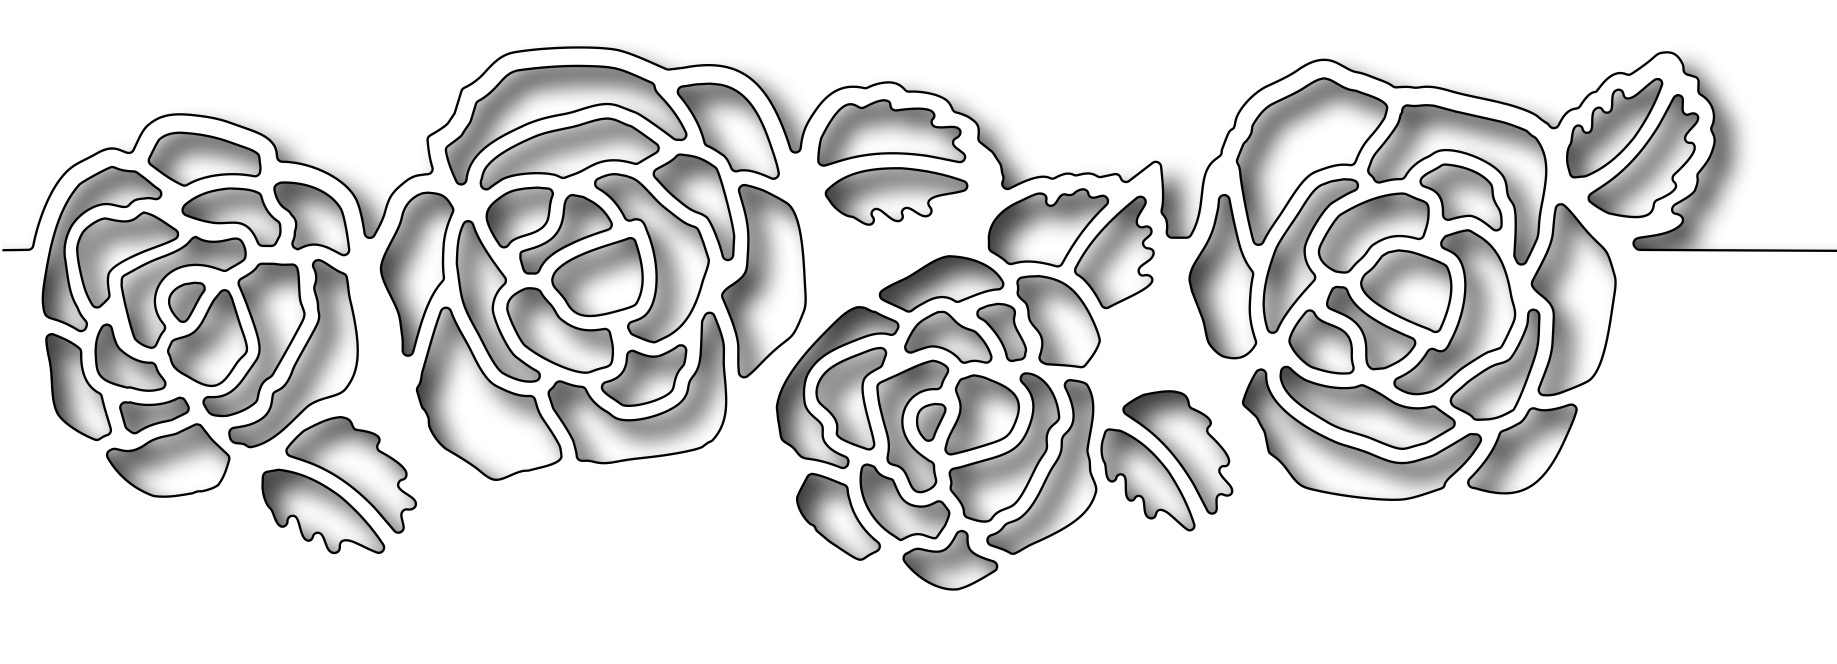 Frantic Stamper Precision Die Rose Cutout Border